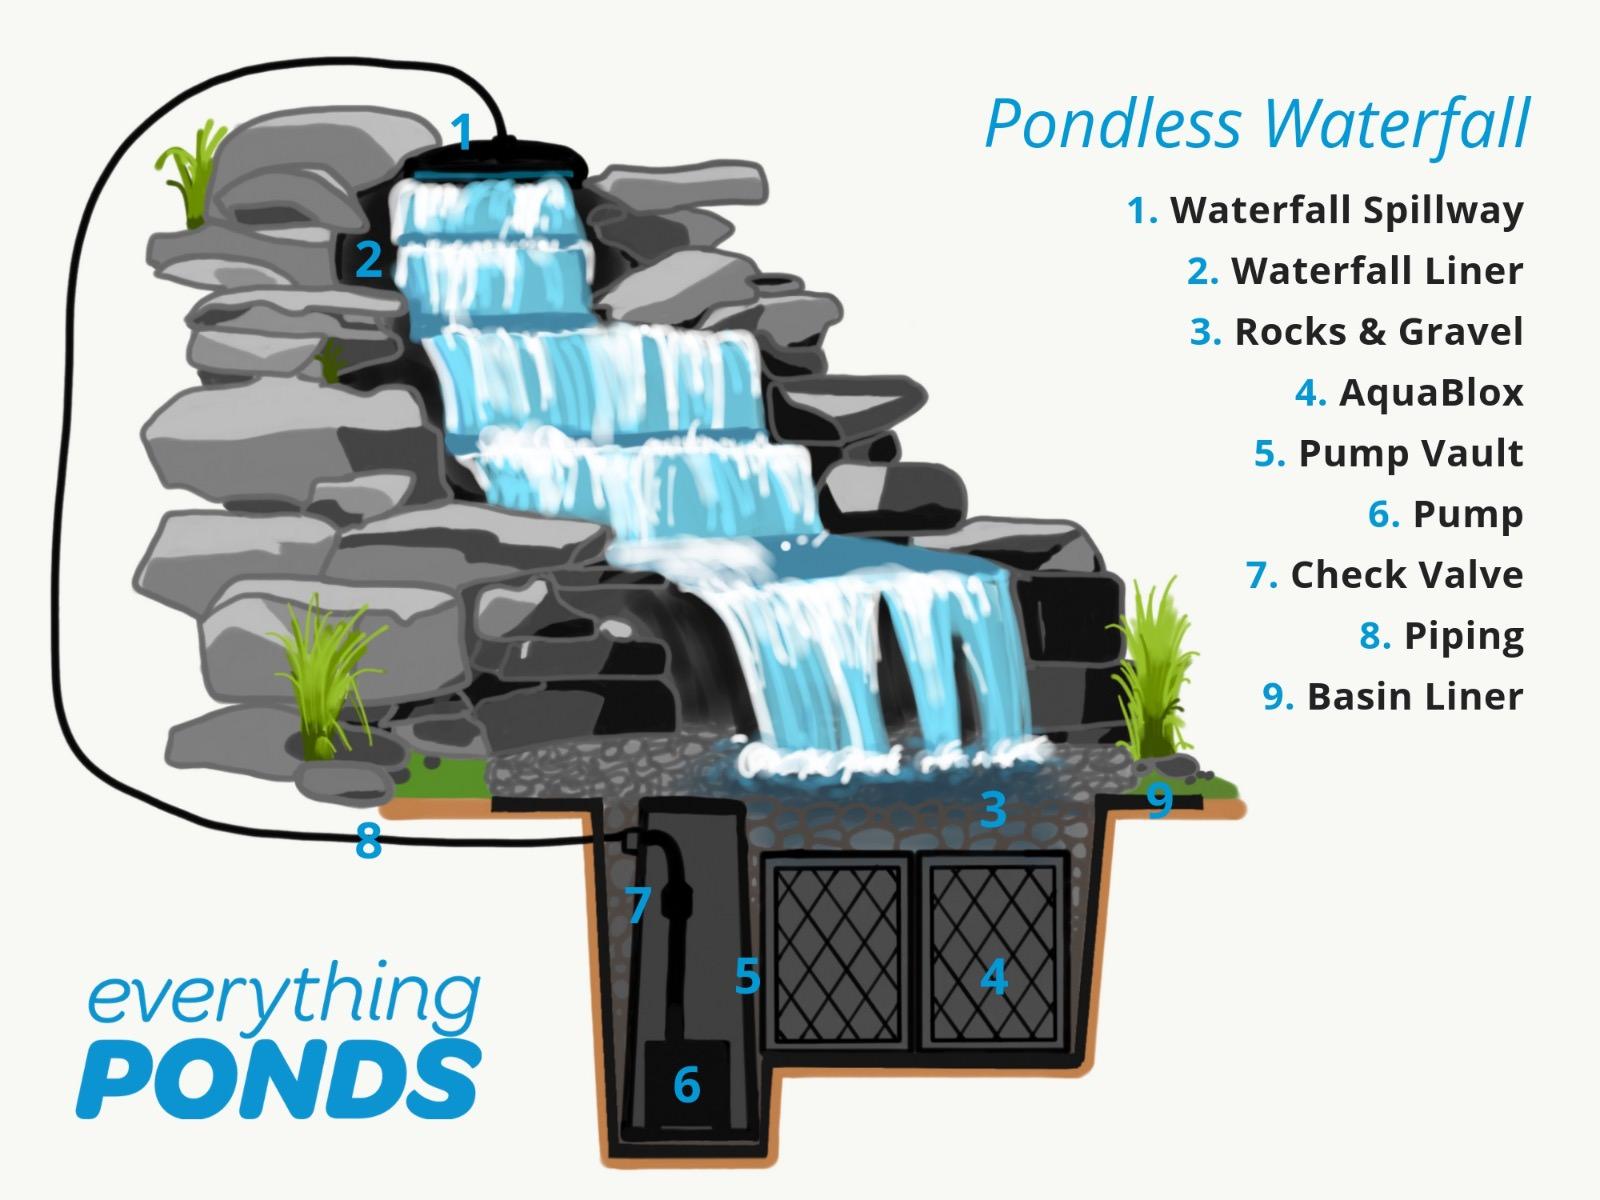 Shop Pondless Waterfall